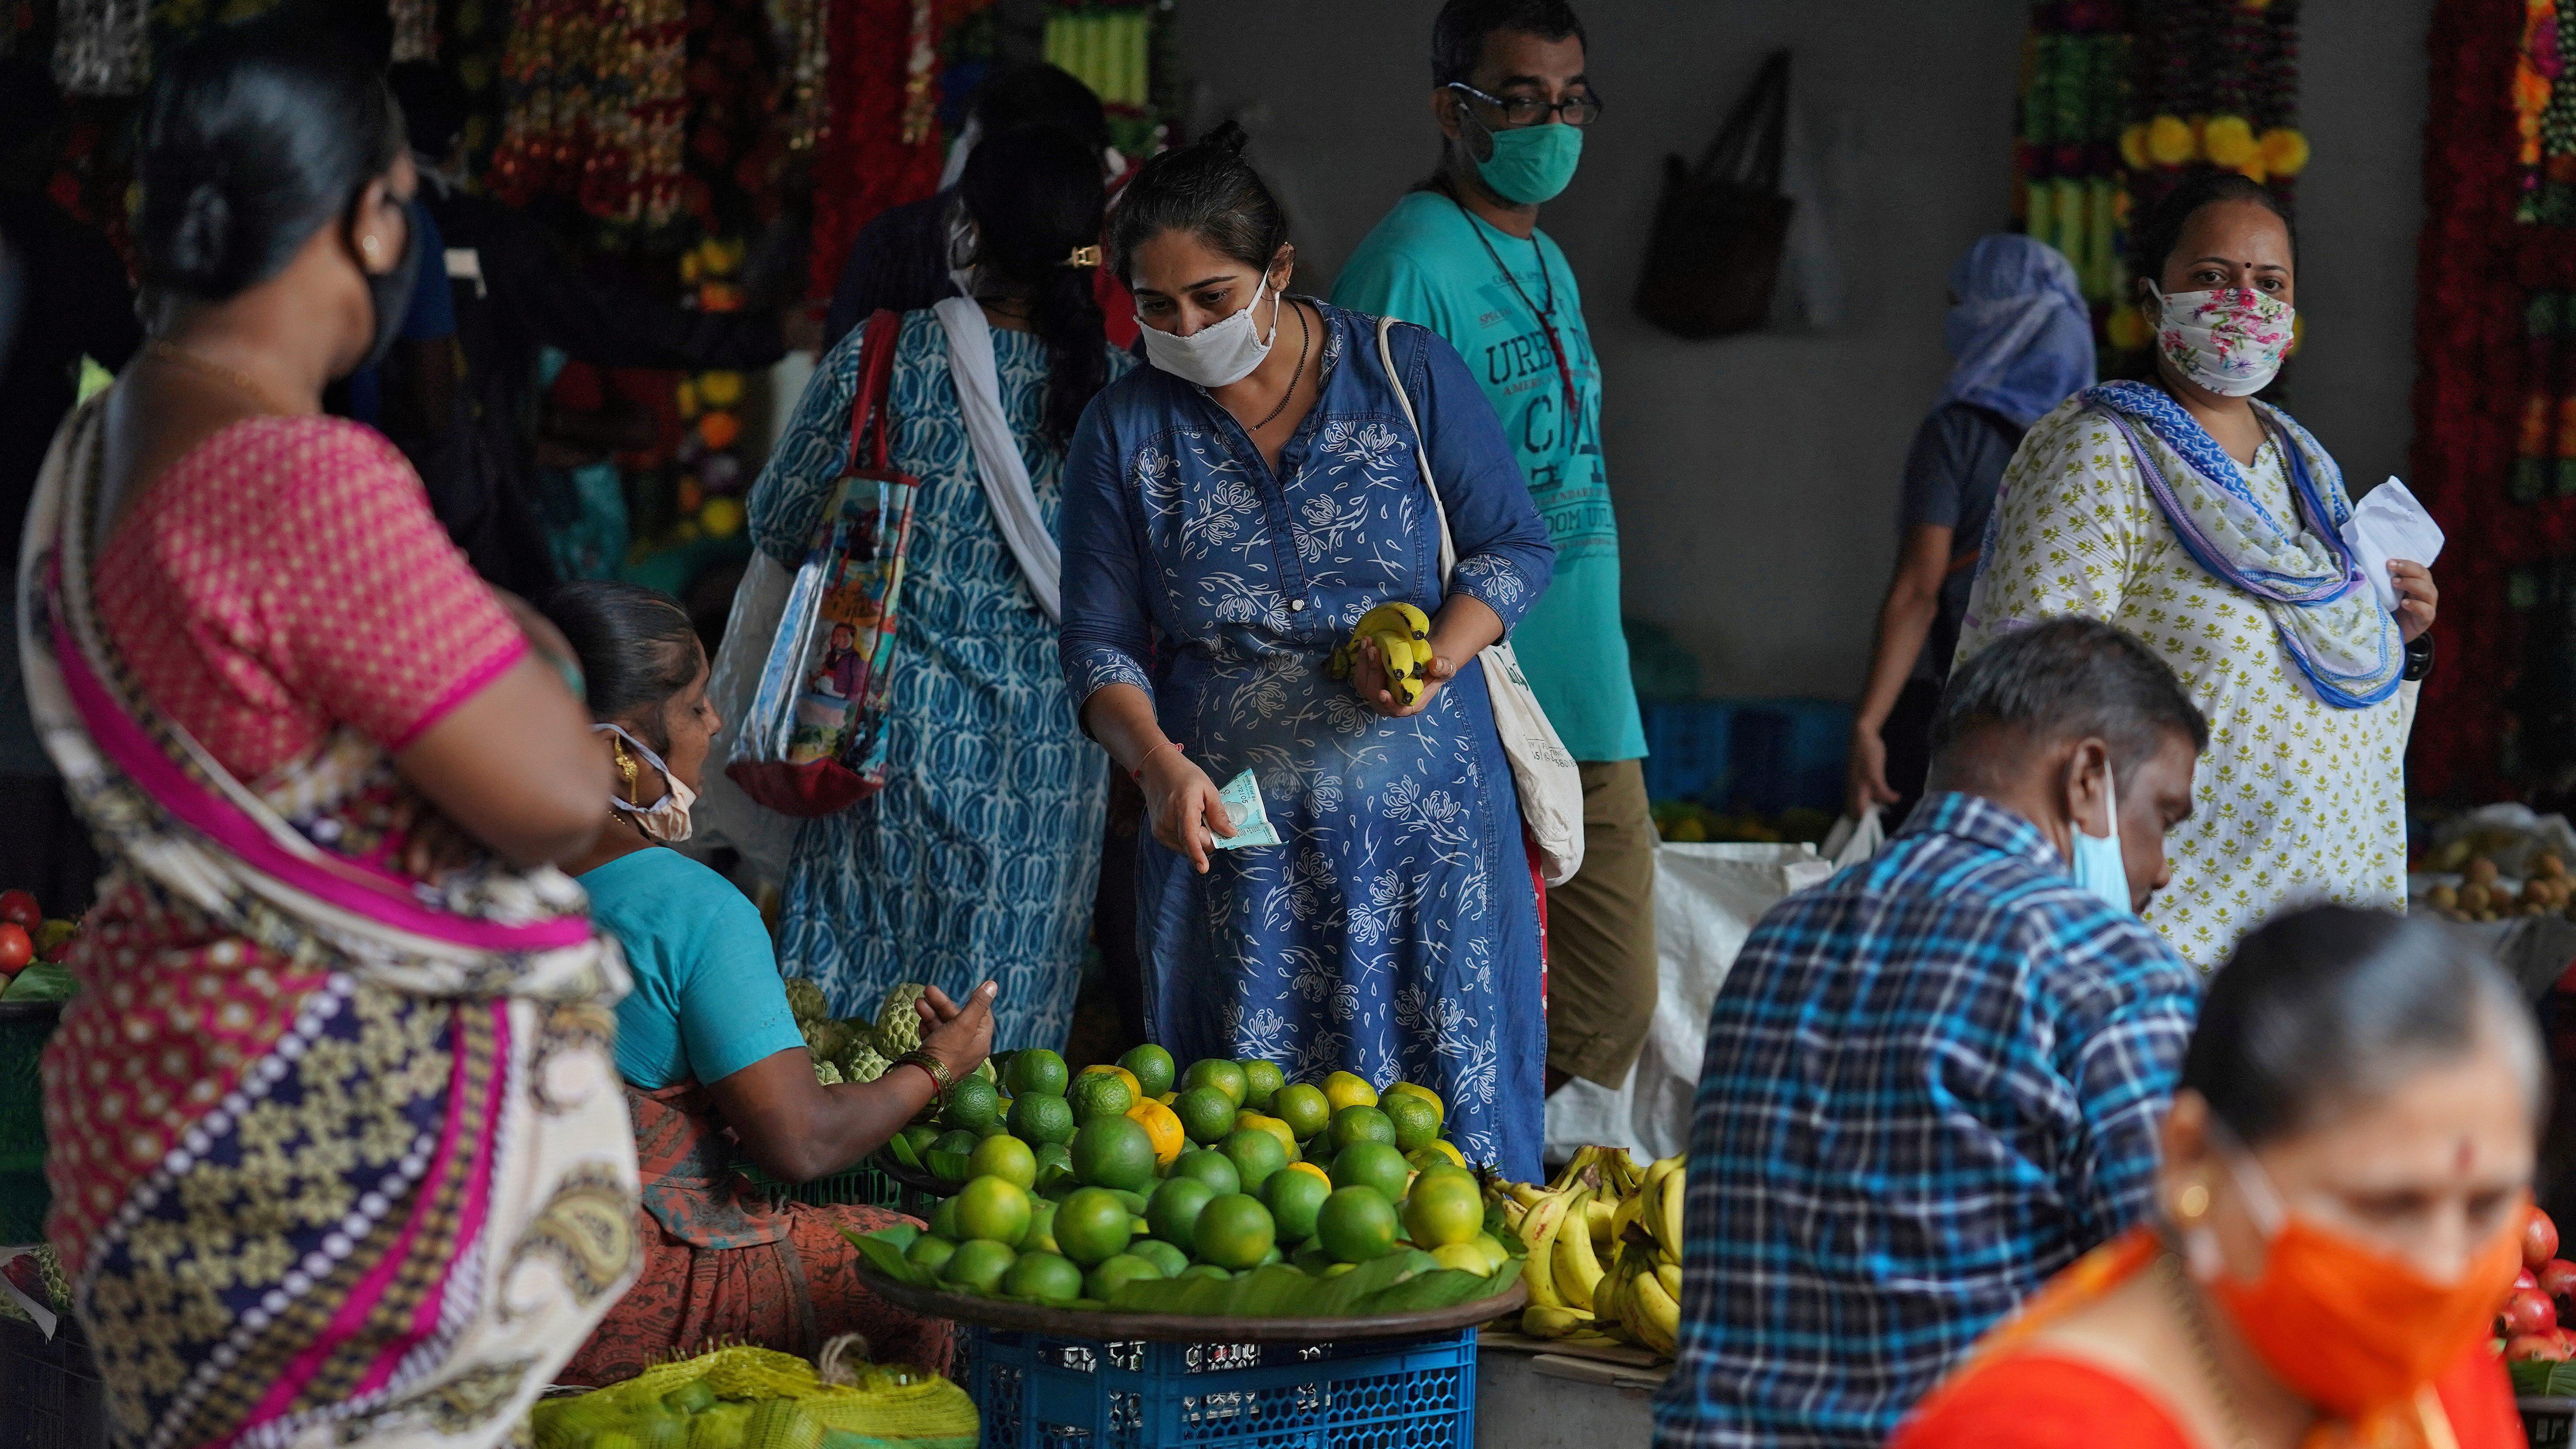 FILE PHOTO: Outbreak of coronavirus disease (COVID-19) in Mumbai